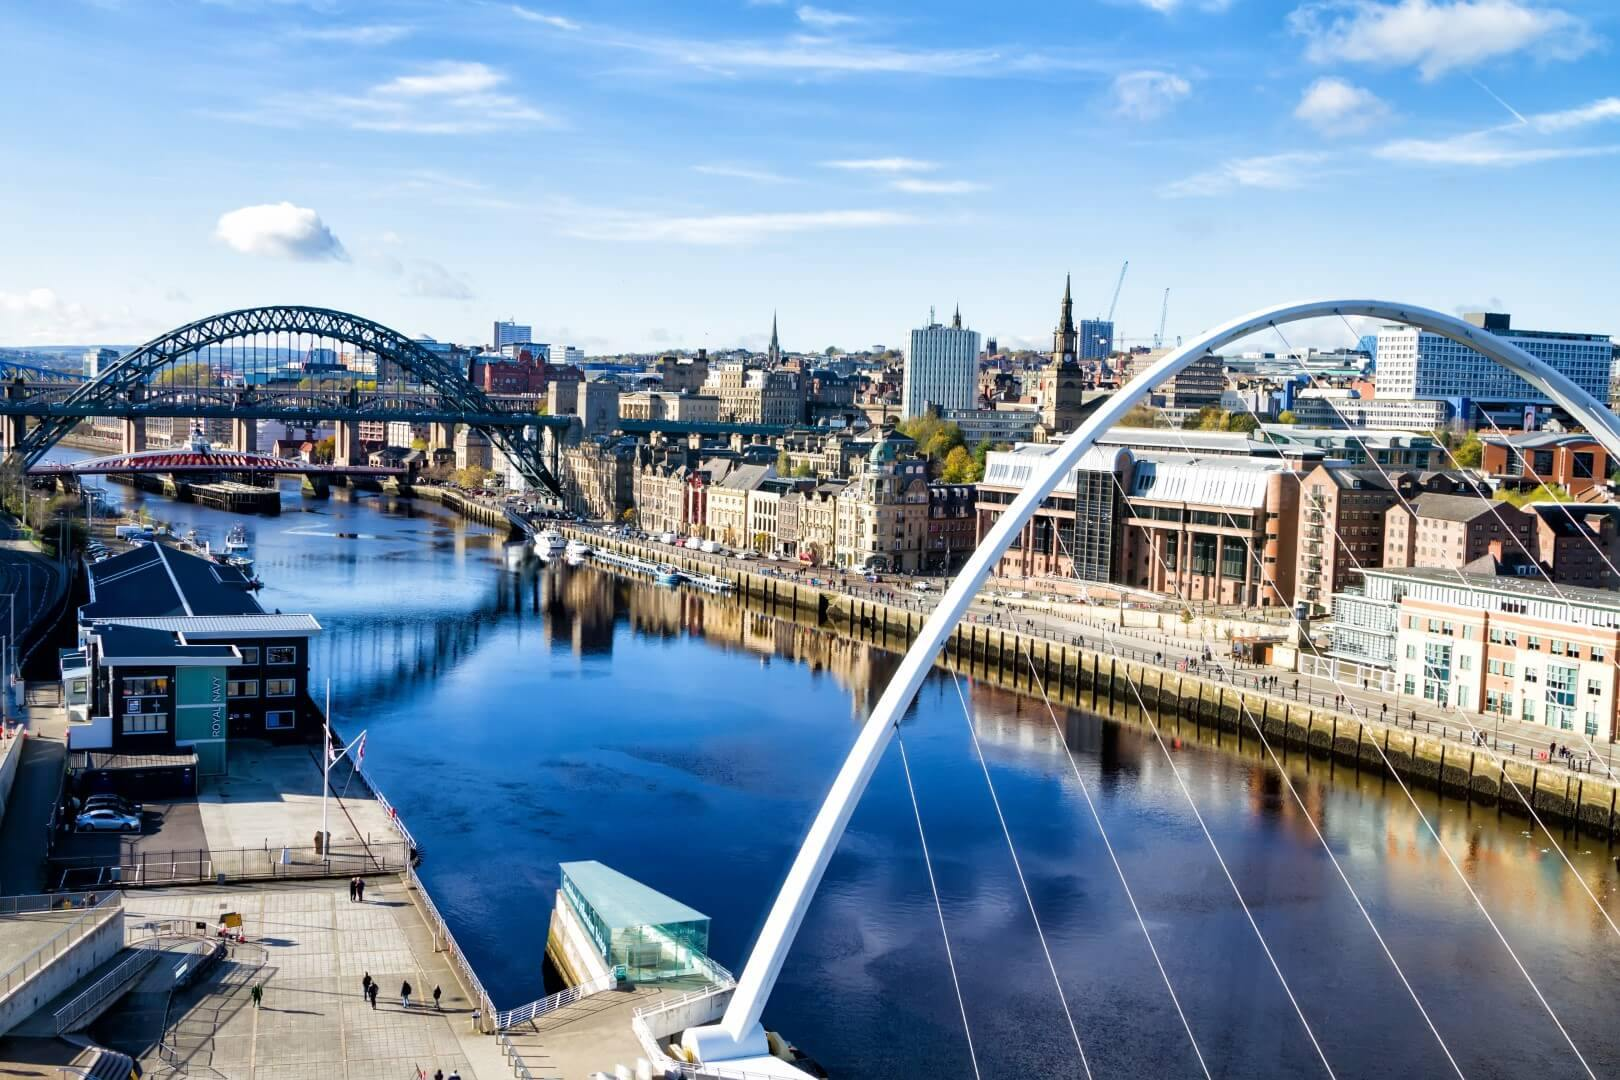 pohled na řeku v Newcastle